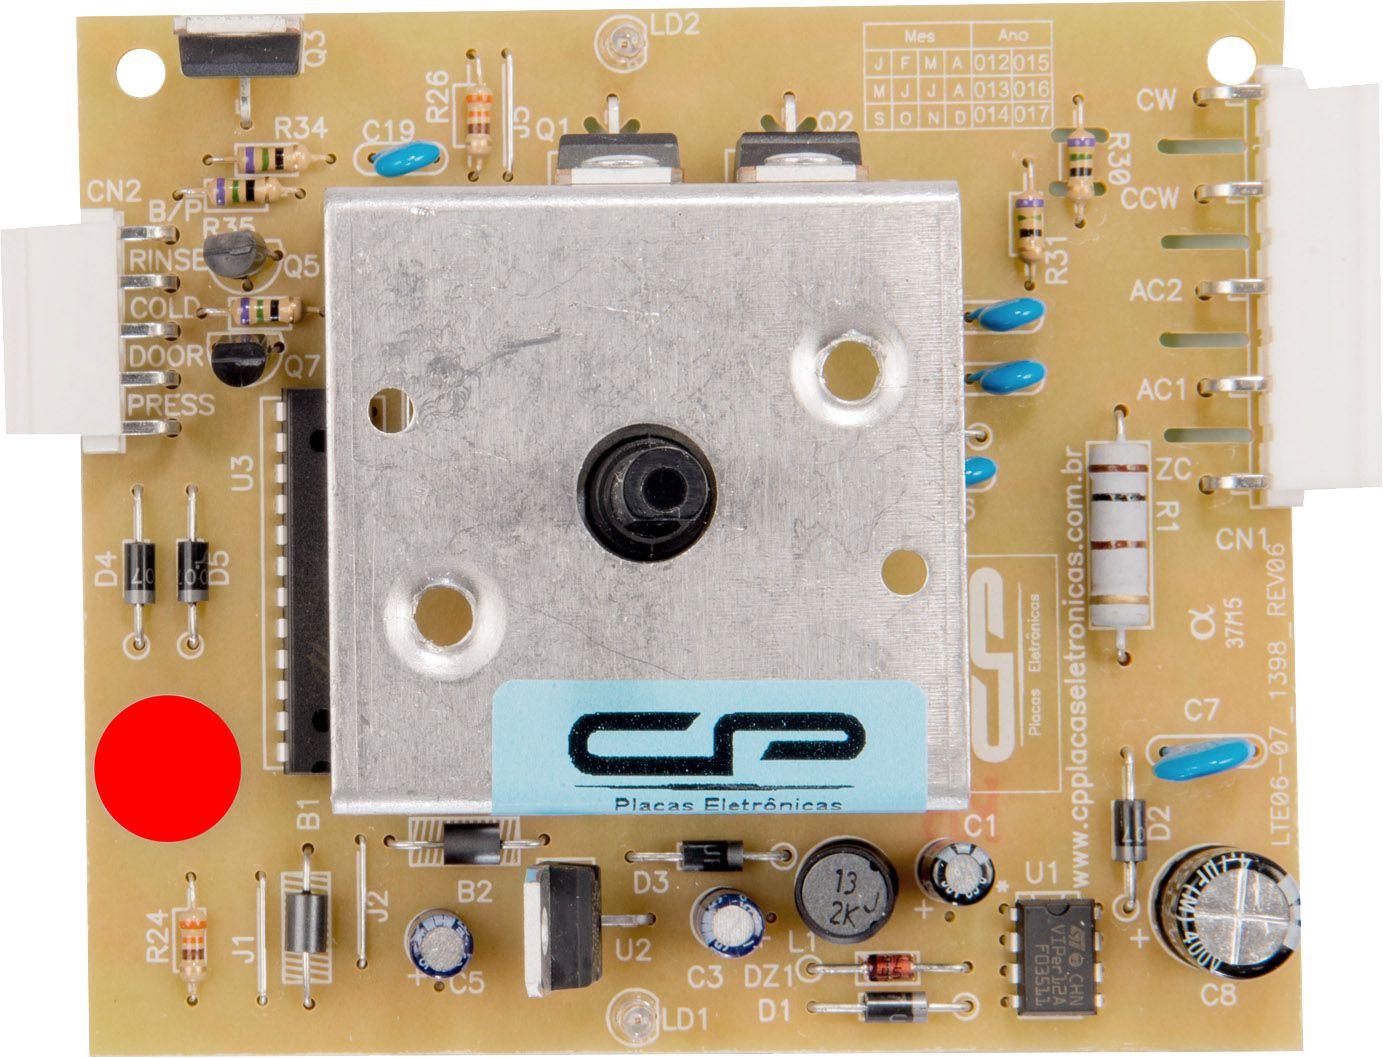 Placa Eletrônica Lavadora Electrolux Lte06 Bivolt Cp (CP1239)